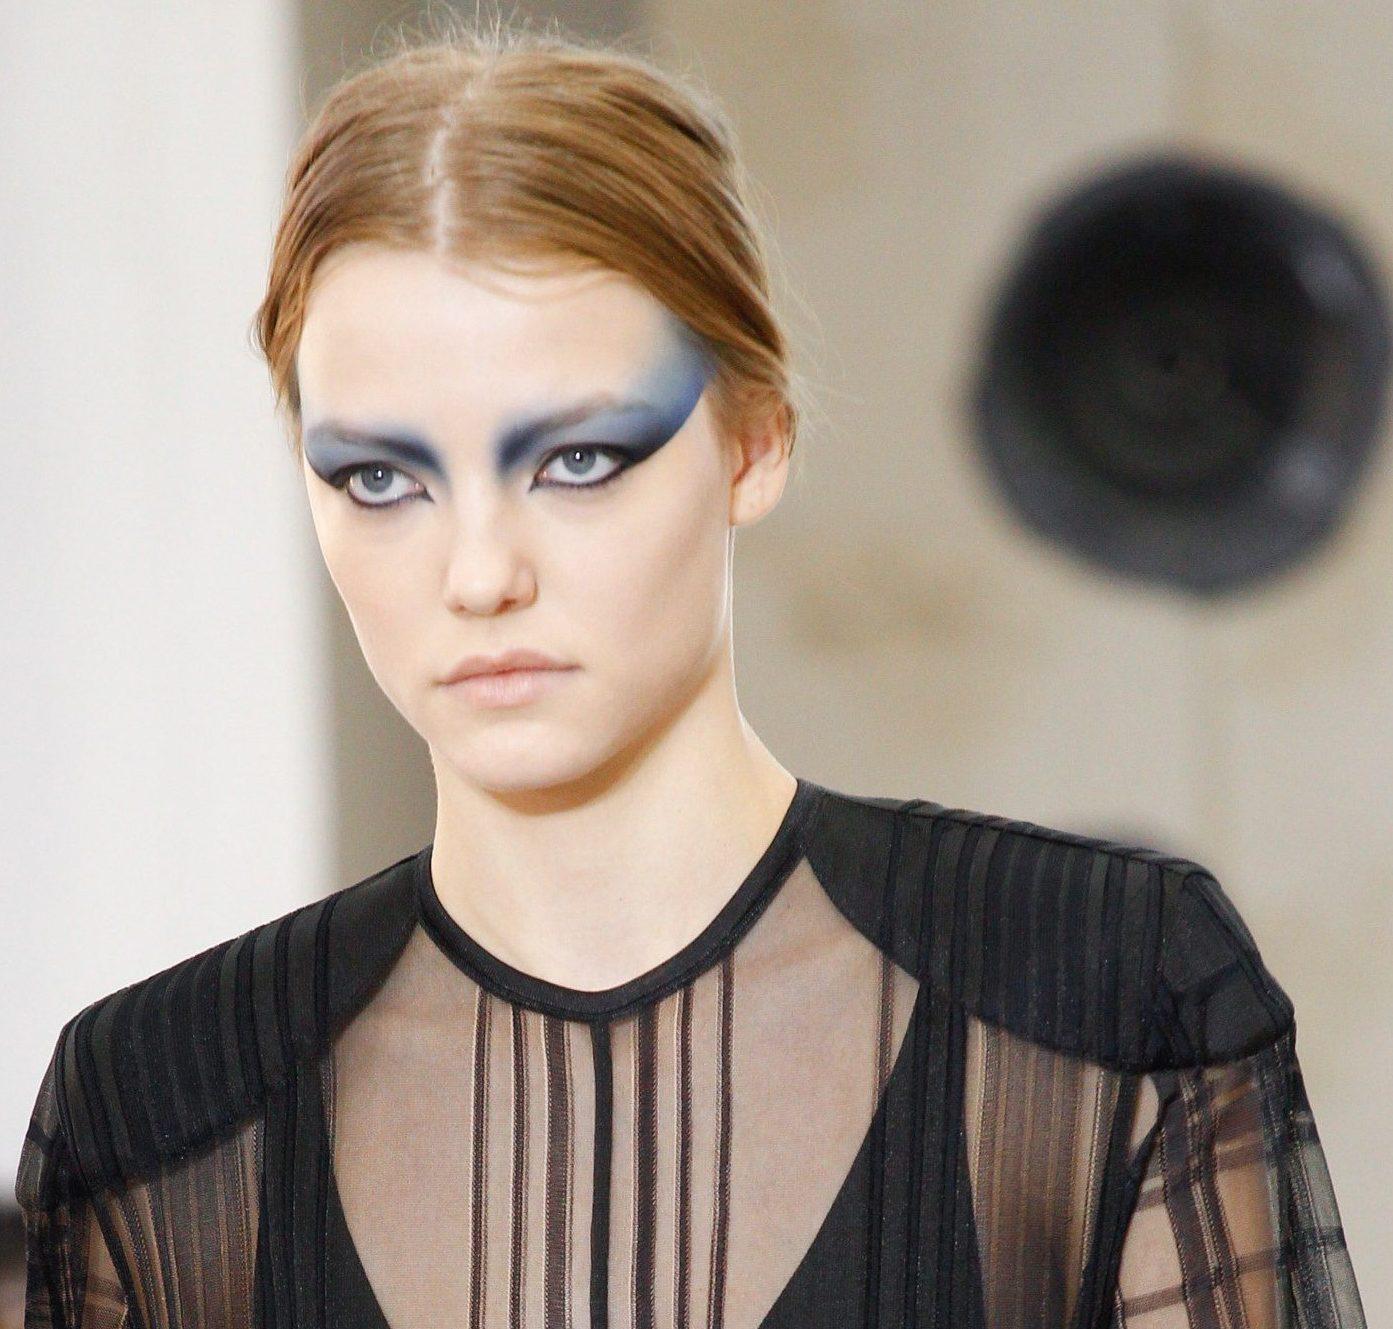 louis-vuitton-ss17-collection-top-hair-makeup-looks-statement-eye-shadows